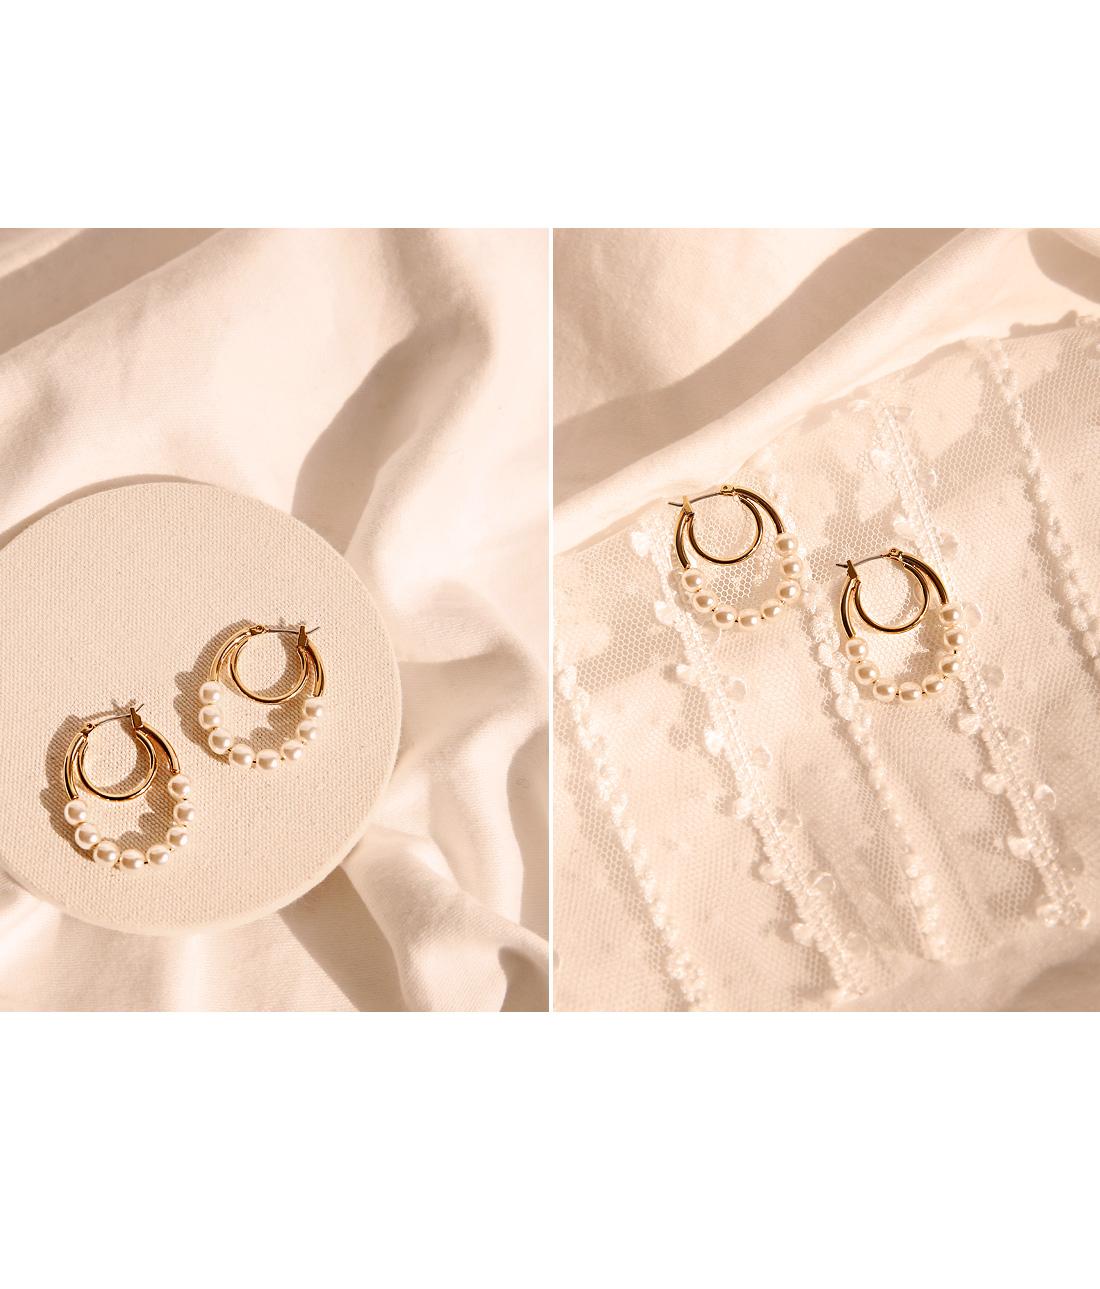 LENT PEARL GOLD 2 RING EARRING